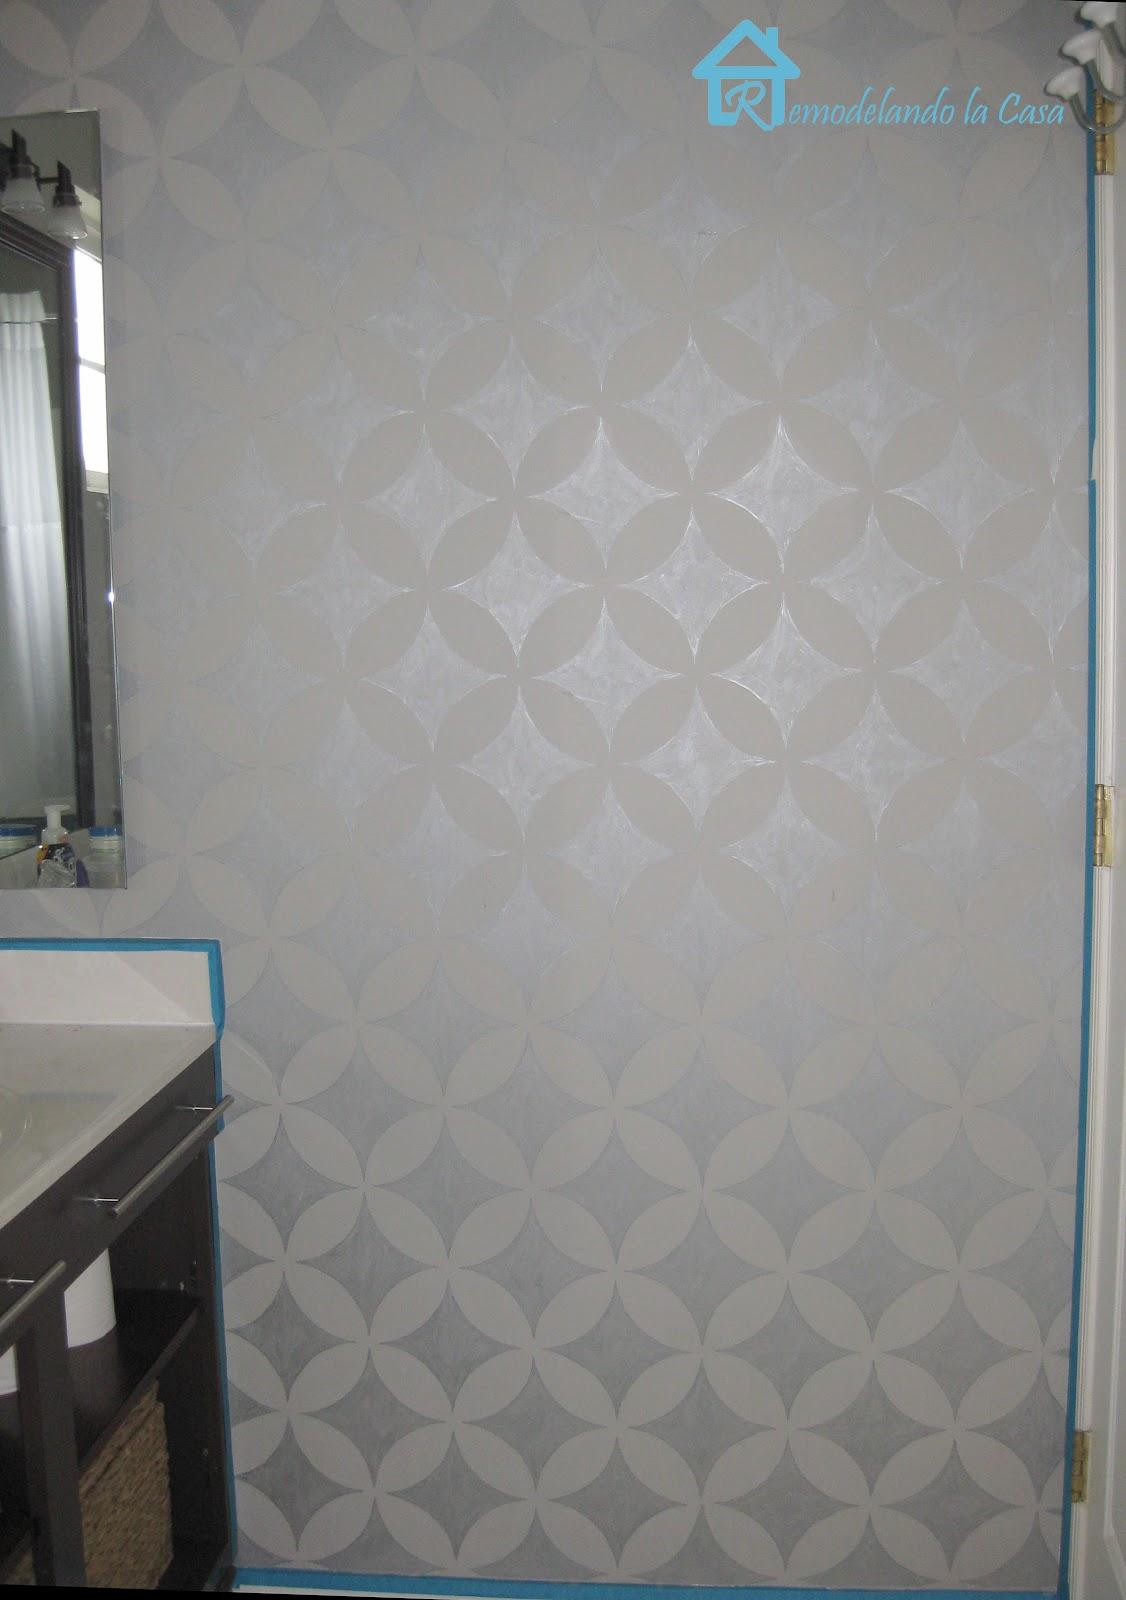 Painted geometric wall remodelando la casa for Geometric wall paint